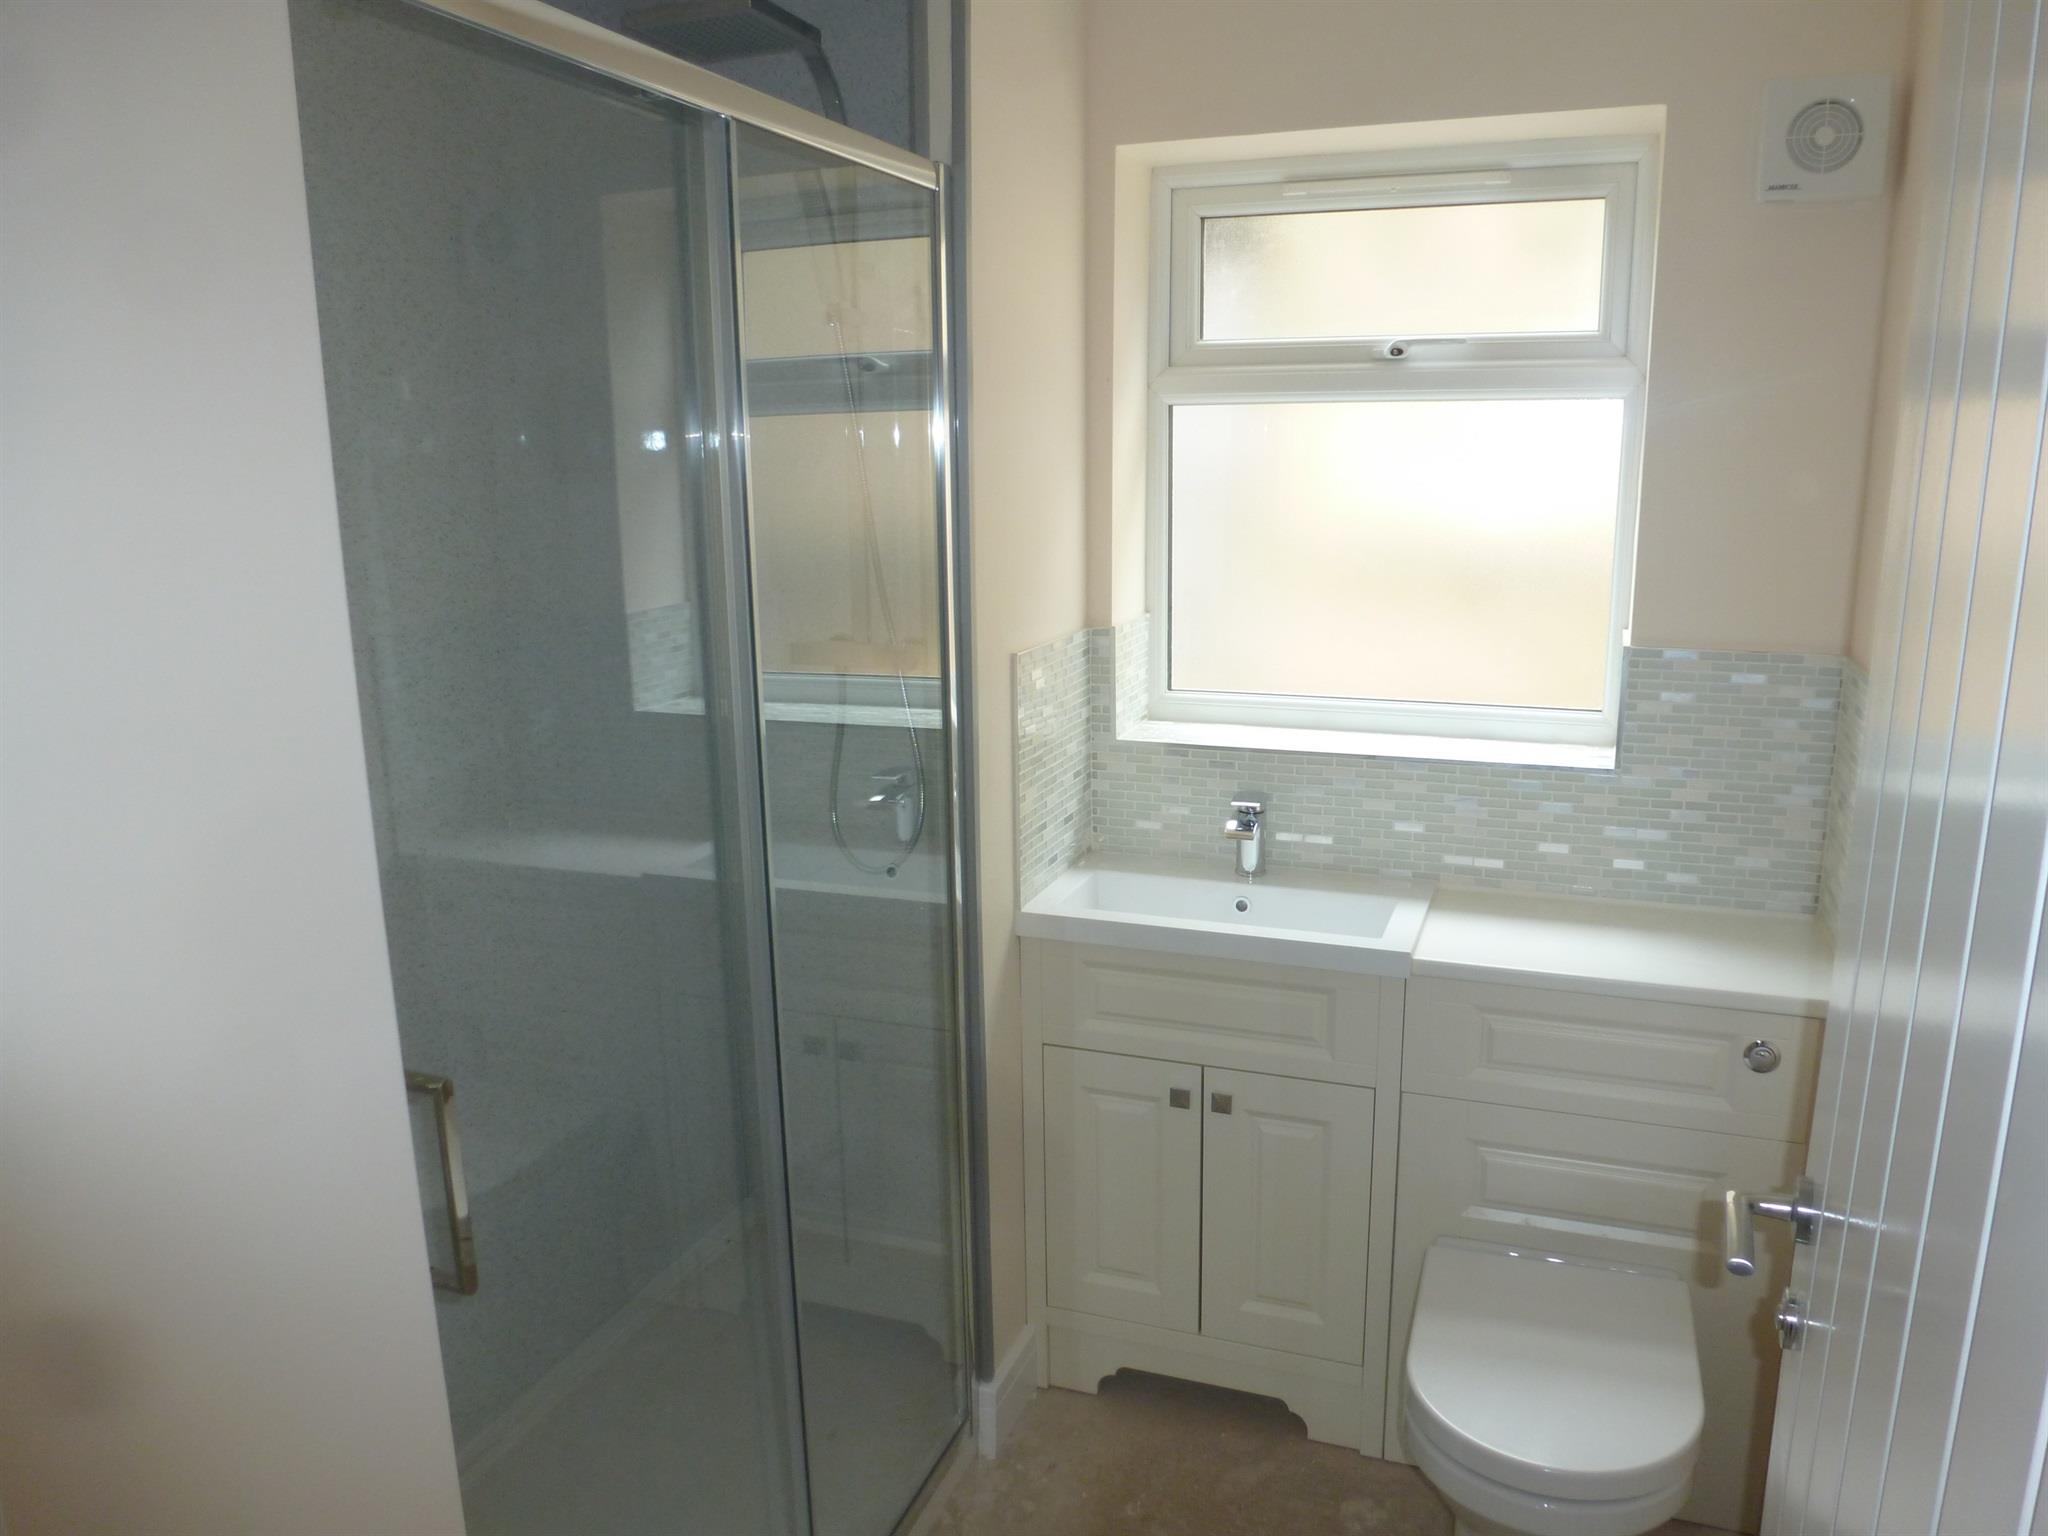 Is 747 A Good Credit Score >> 2 bedroom detached bungalow for sale, Balmoral Avenue, Spalding, PE11 2RN